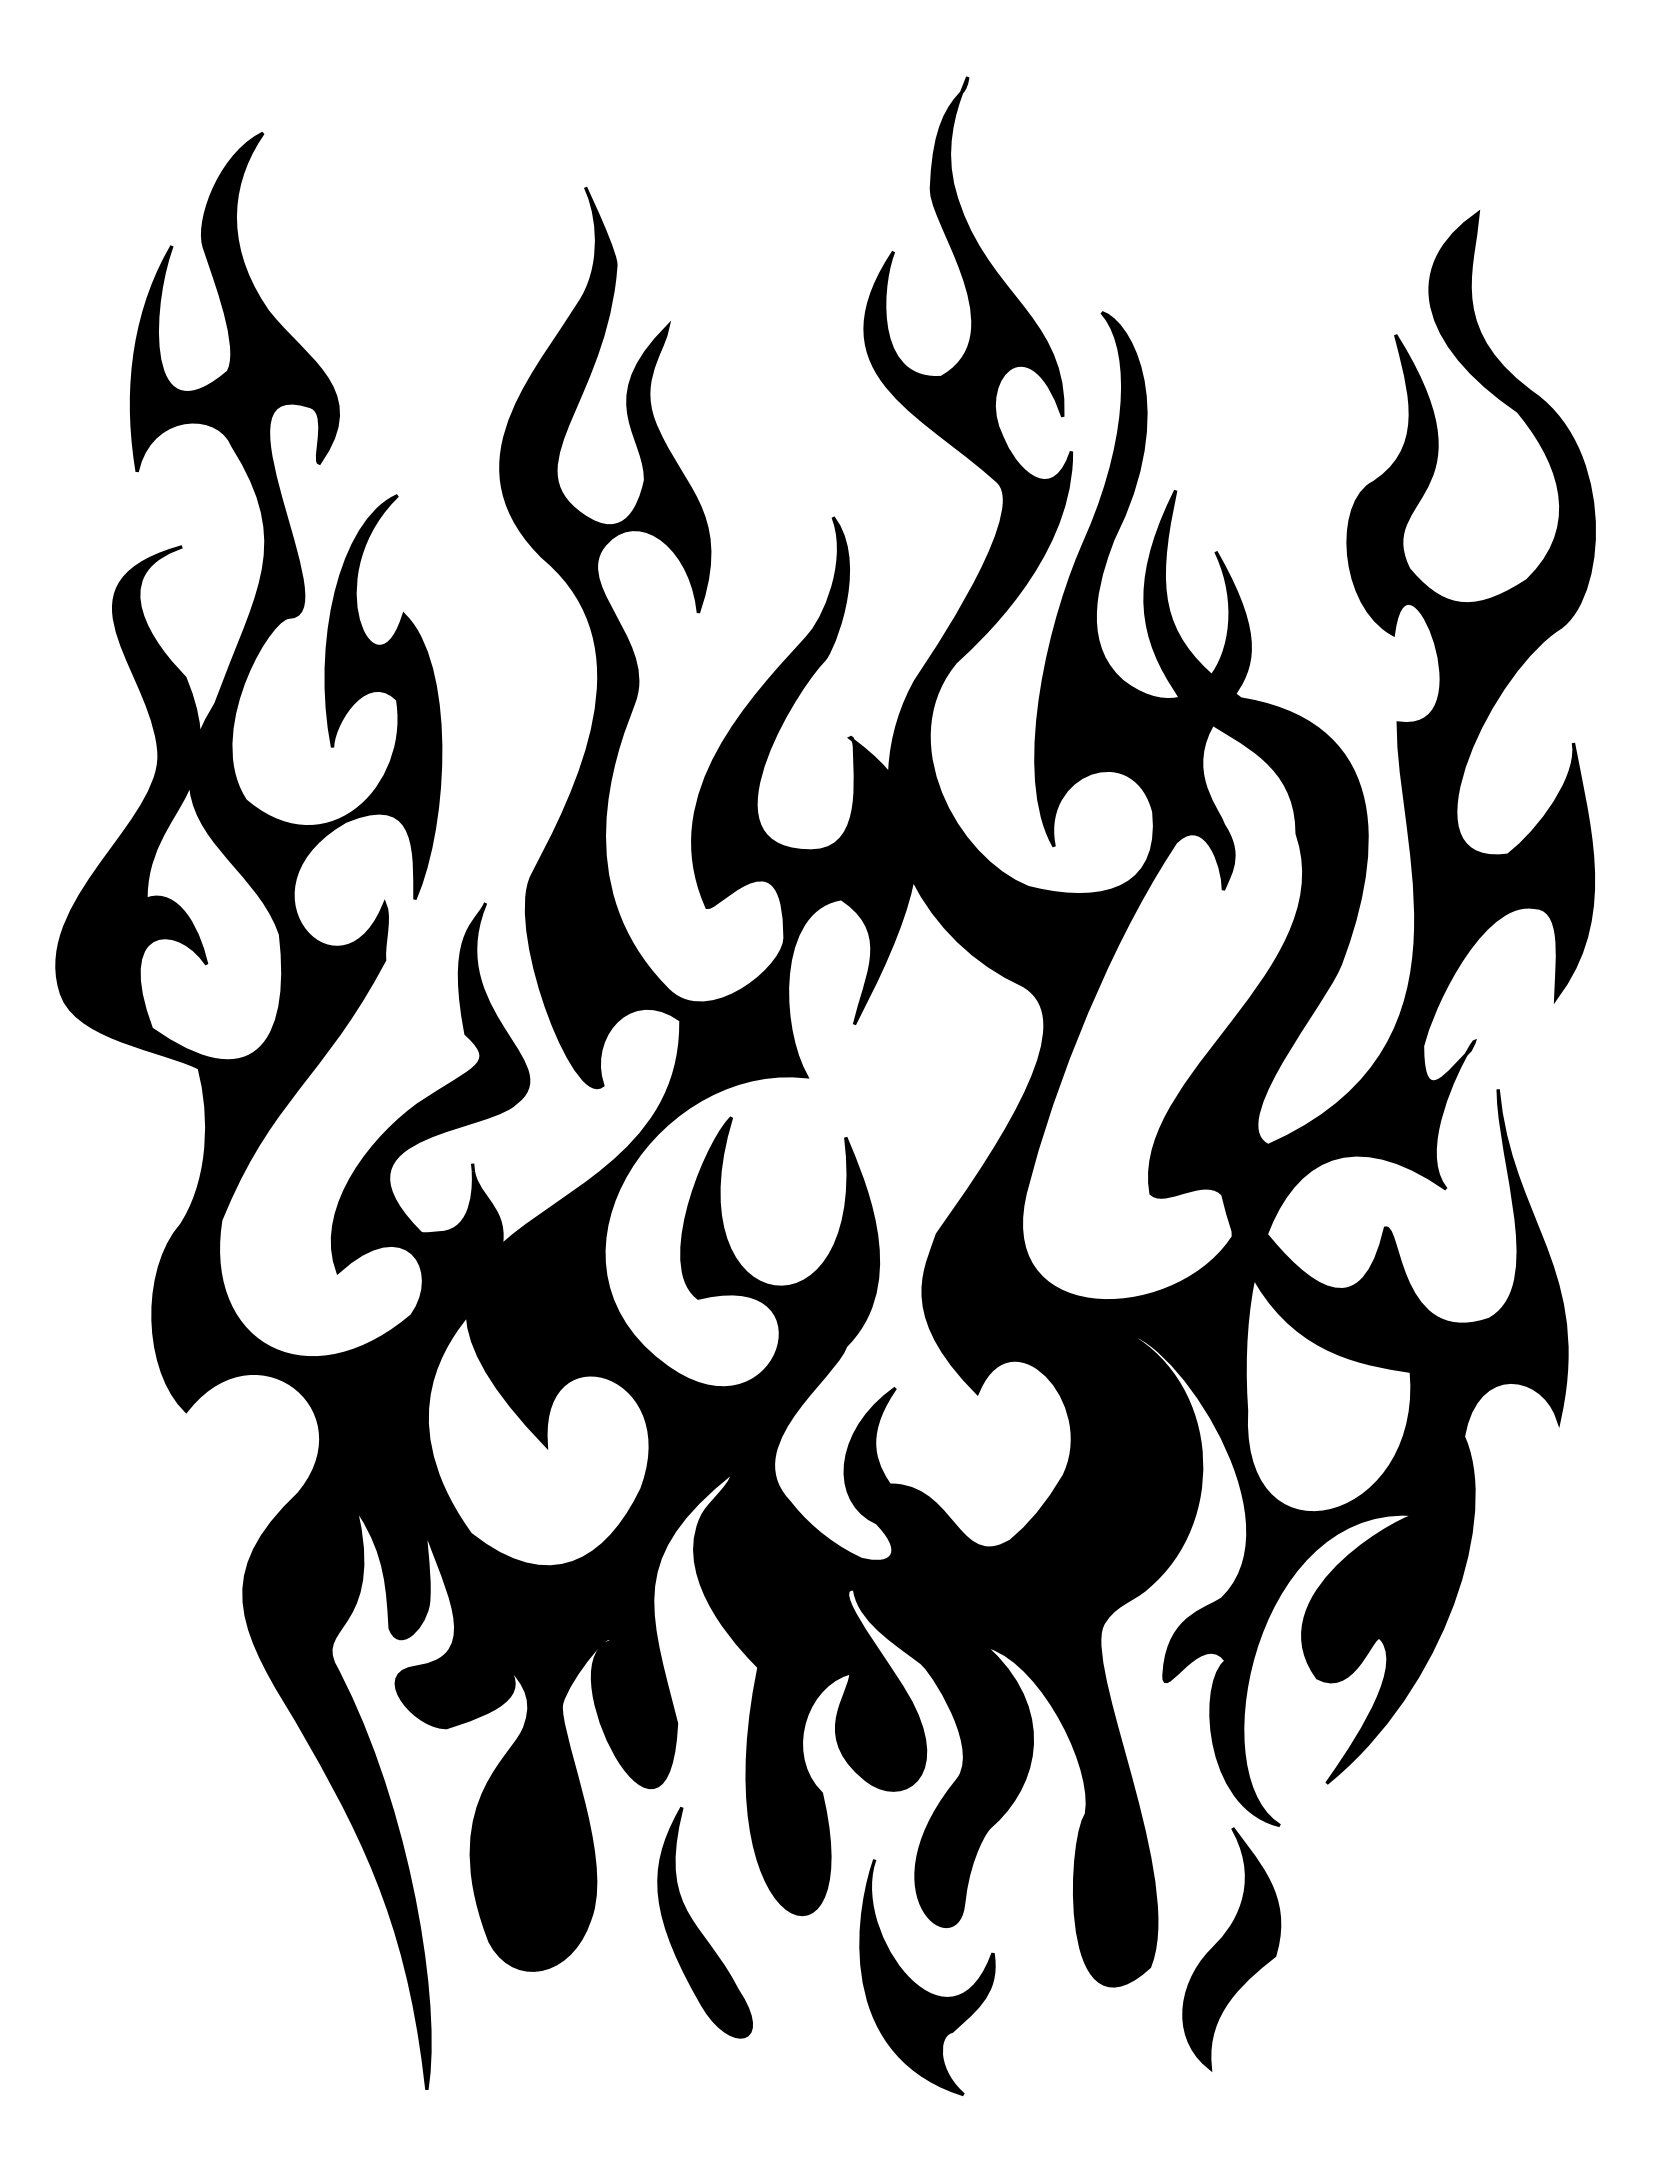 30 Flame Tattoo Design Stencils